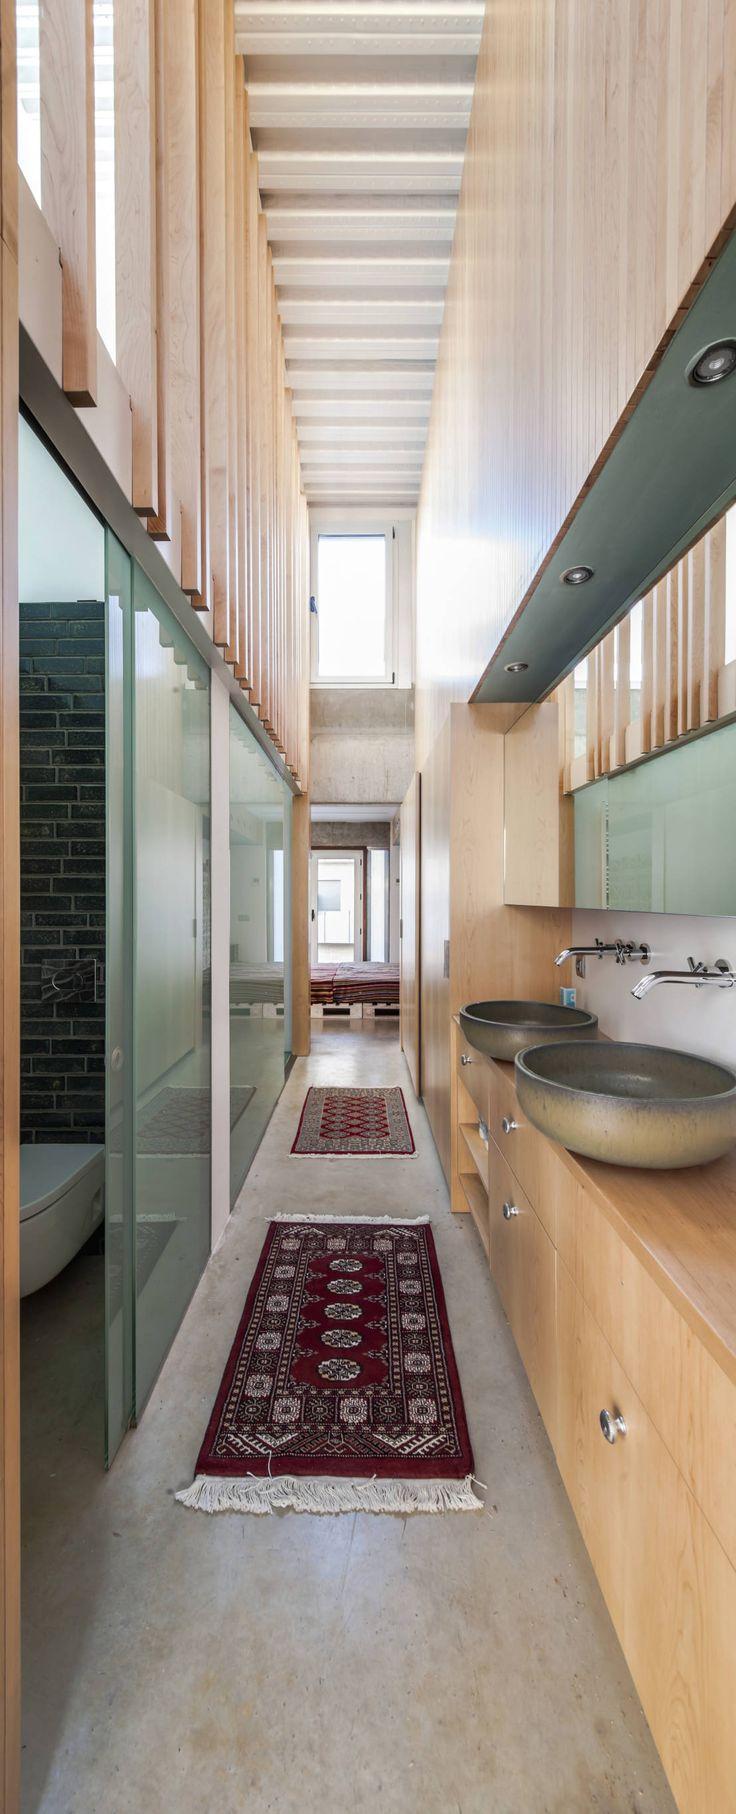 Mercer island luxury waterfront estate idesignarch interior design - Una Casa Arrebatadora En Barcelona